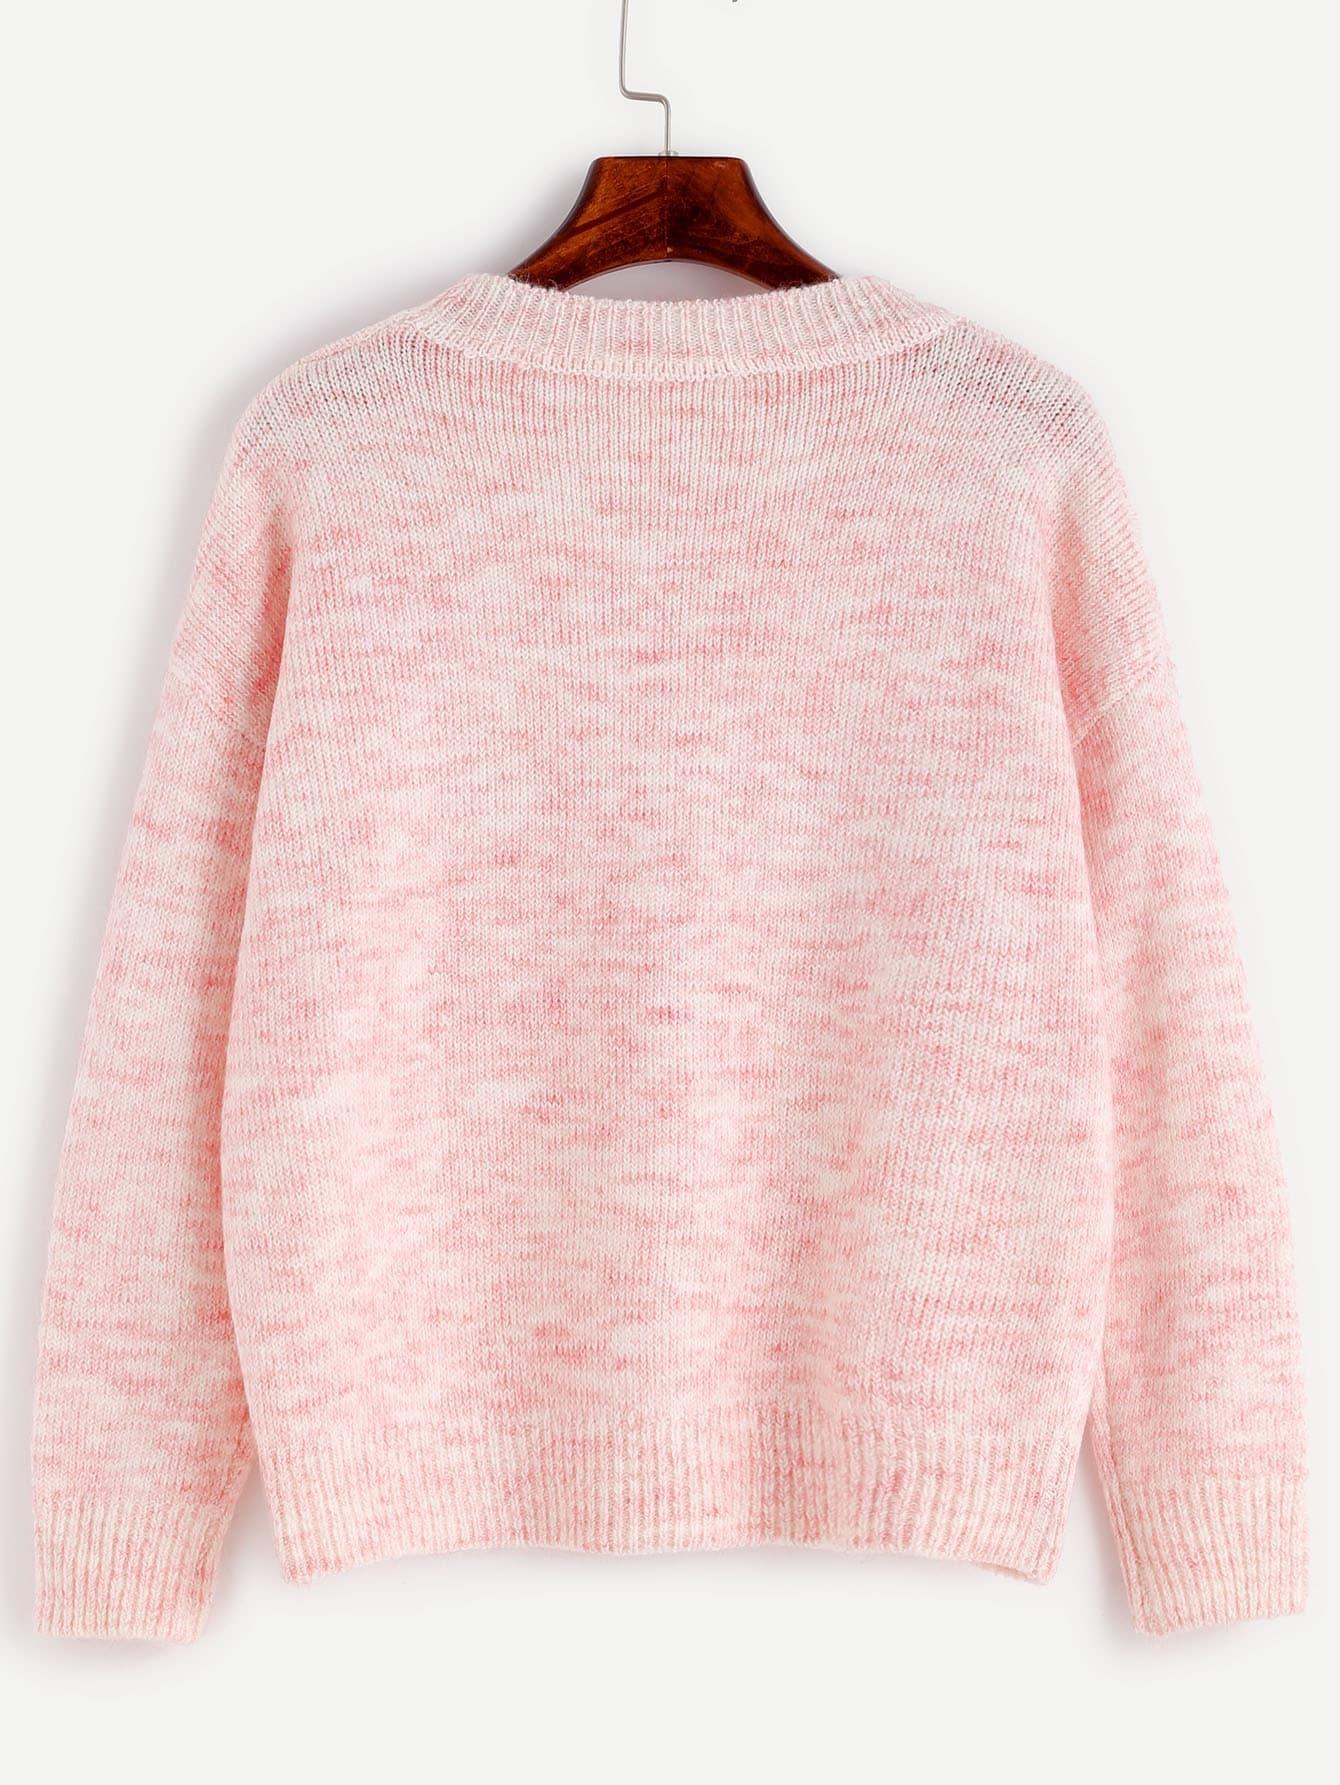 sweater161020104_2